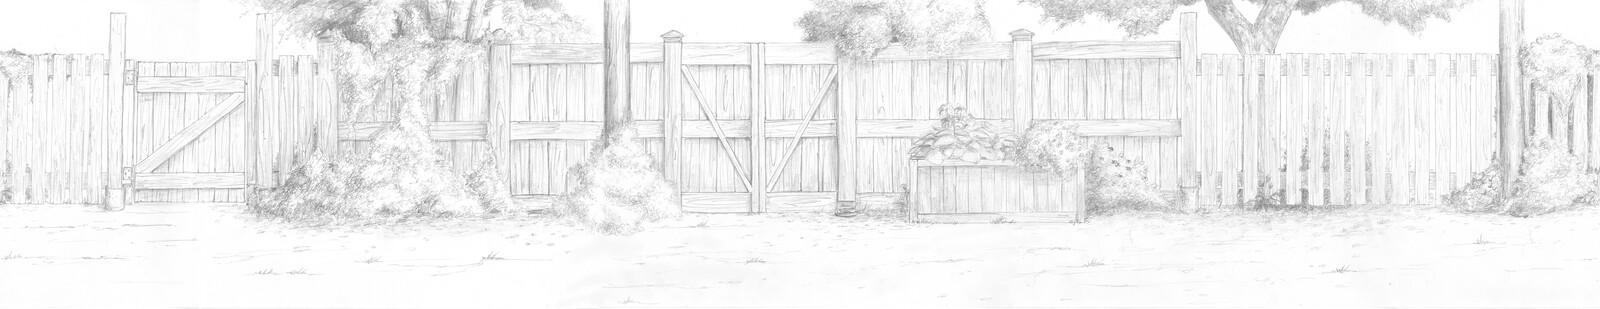 Full hand-drawn background